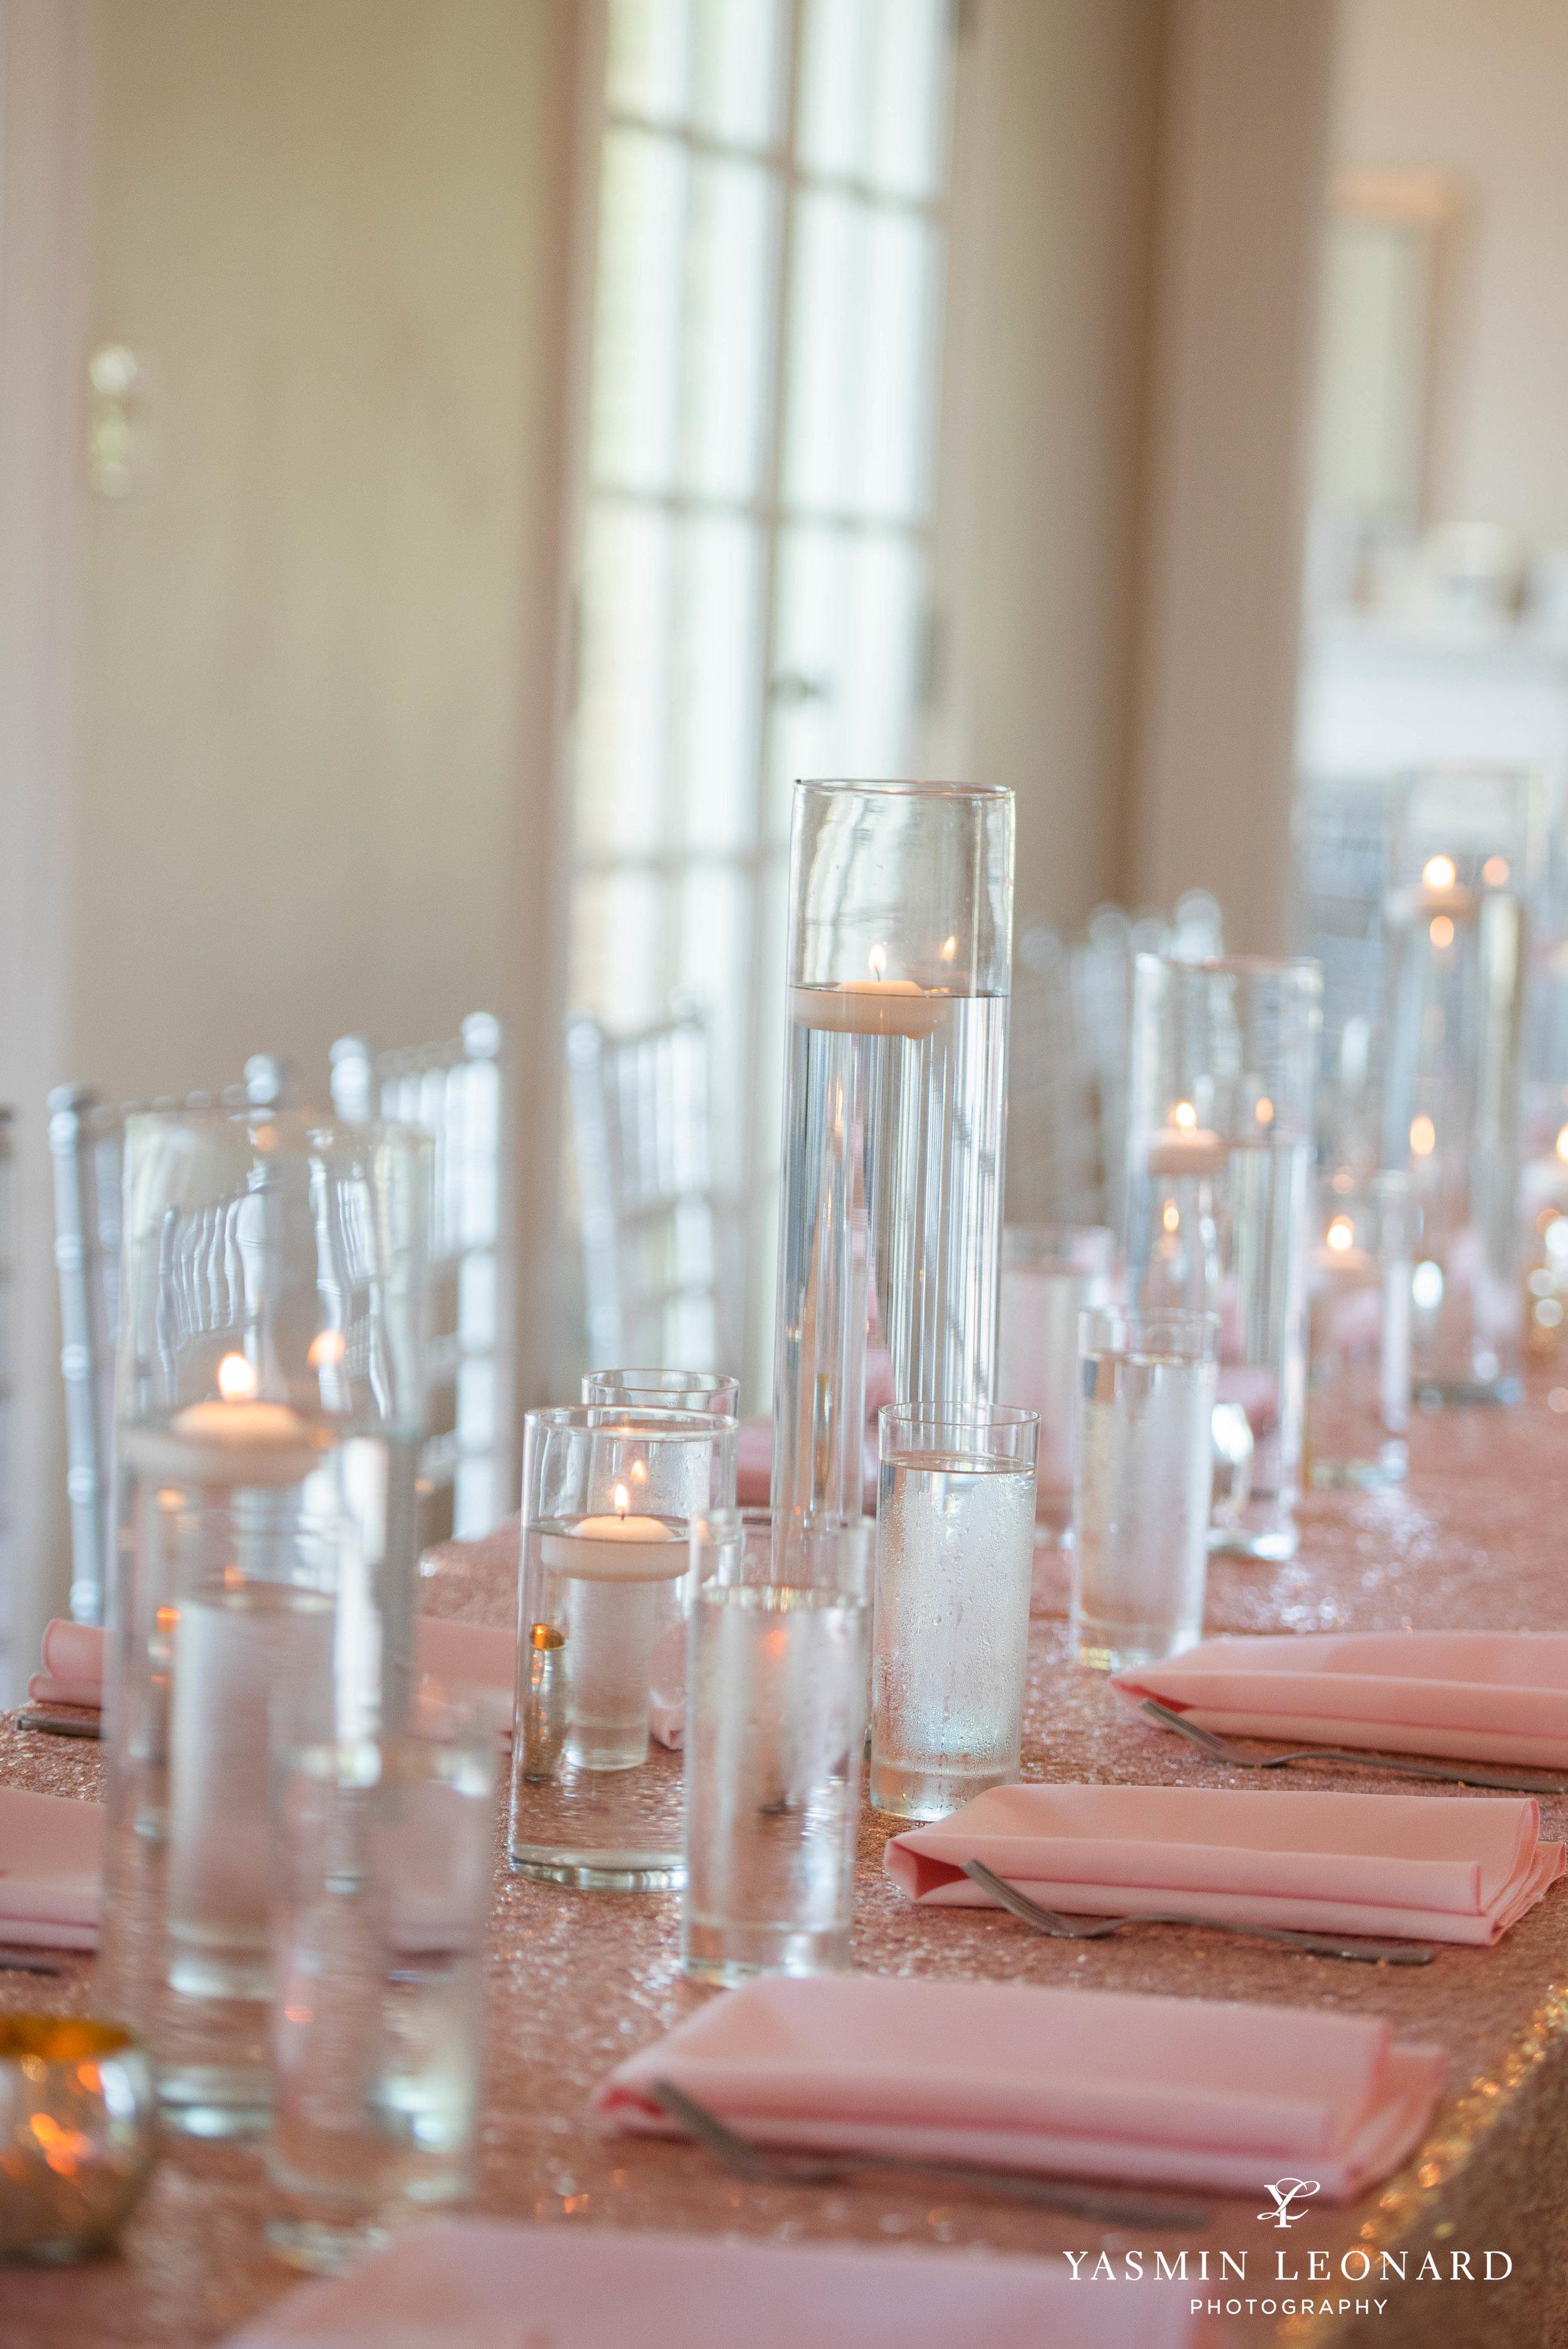 Separk Mansion - NC Weddings - Gastonia Wedding - NC Wedding Venues - Pink and Blue Wedding Ideas - Pink Bridesmaid Dresses - Yasmin Leonard Photography-40.jpg